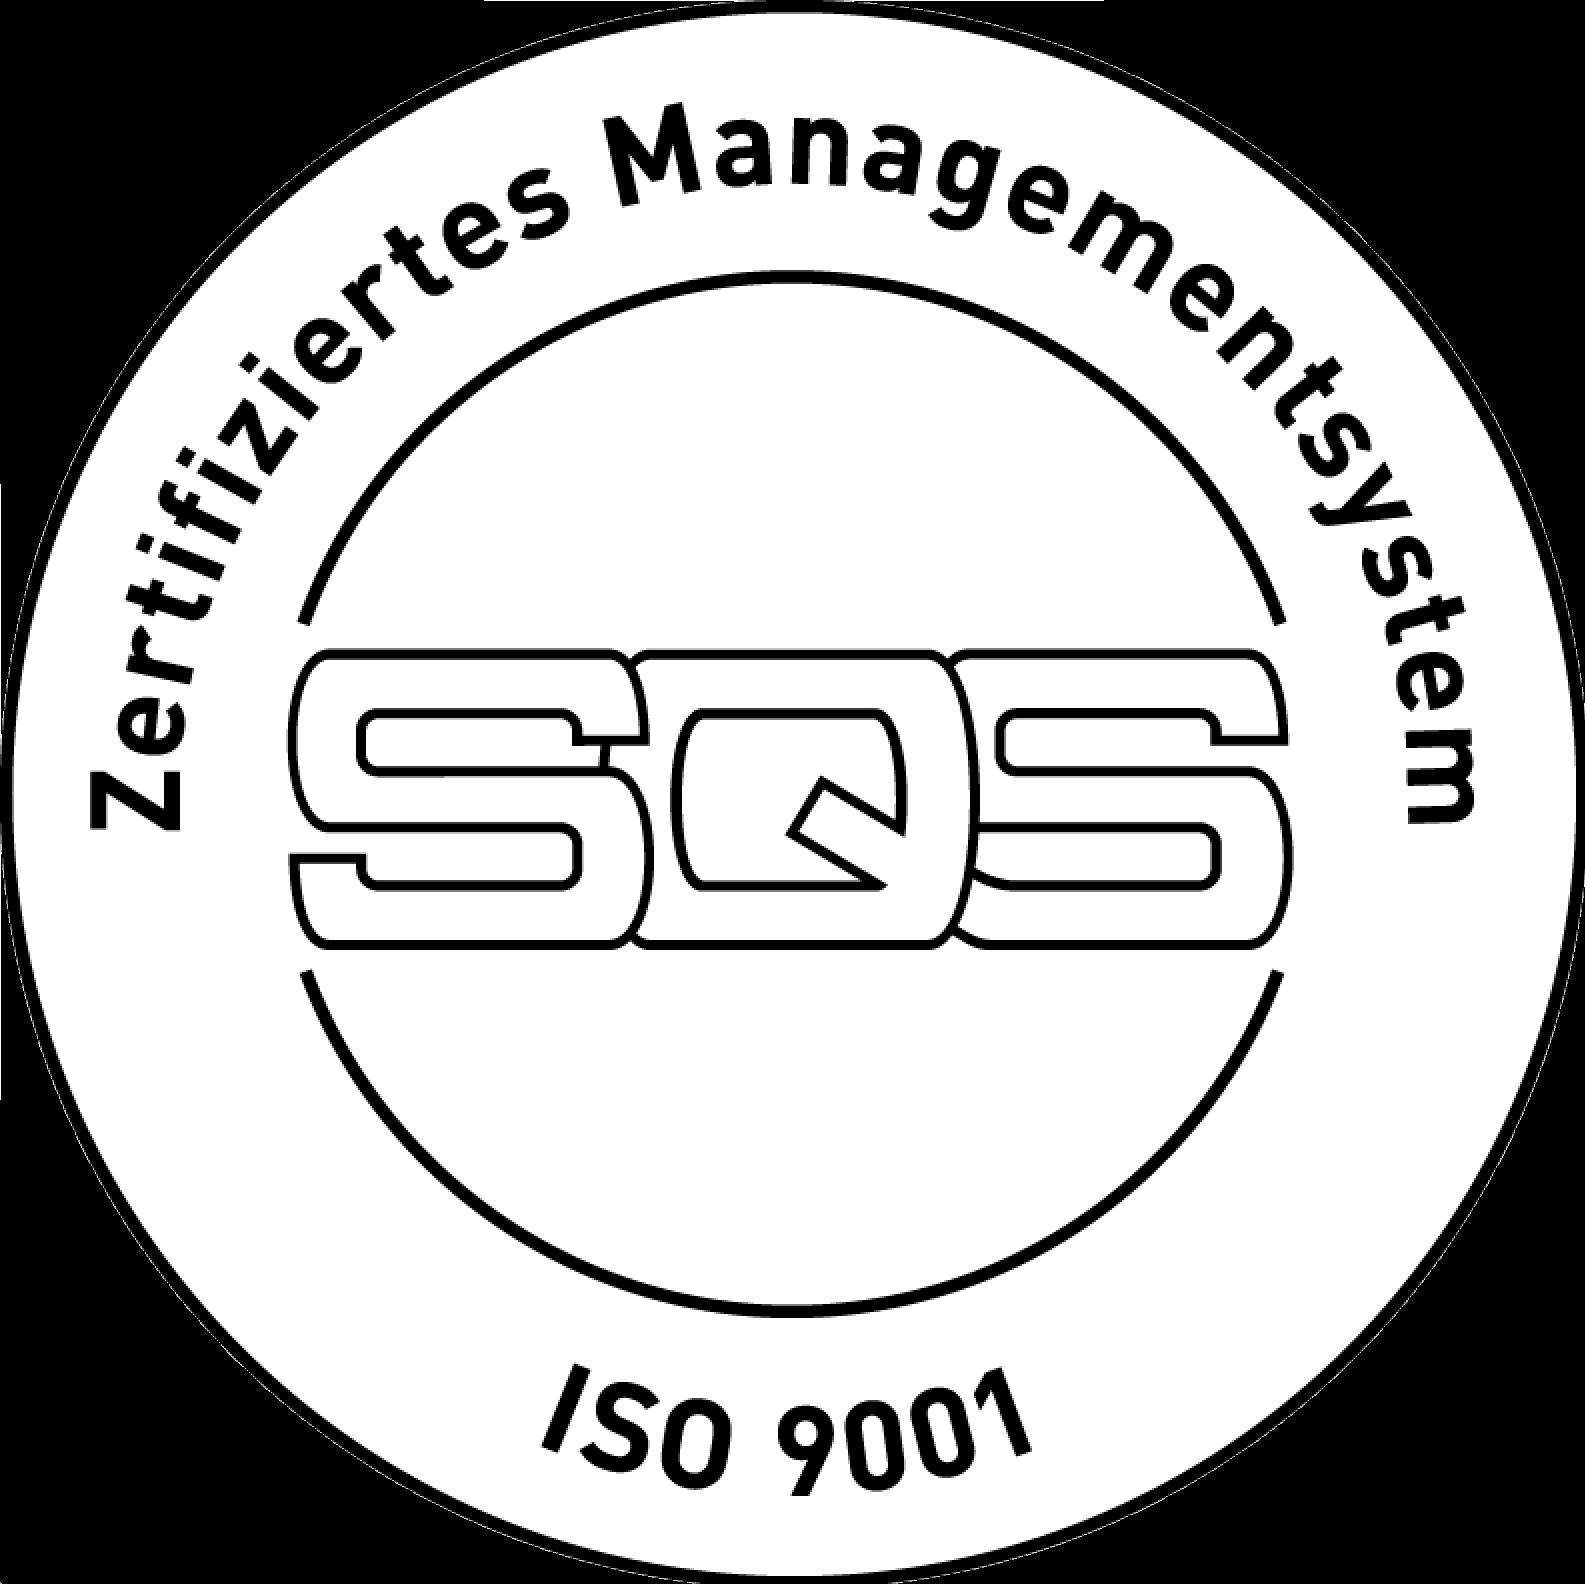 zertifizierung_logo_9001